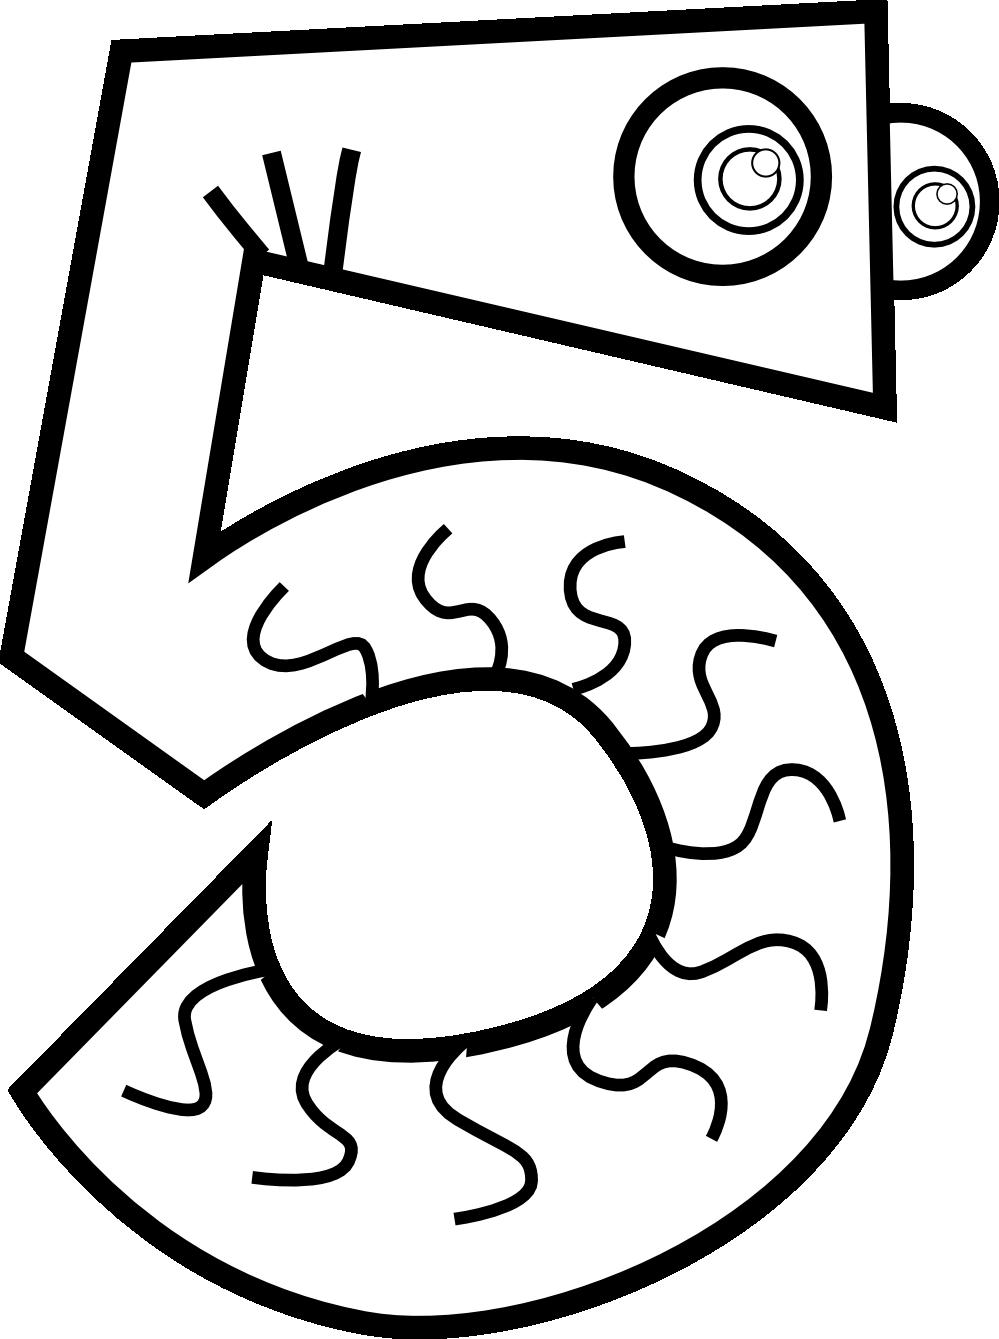 Book panda free clipart vector transparent Number 4 Black And White Clipart #1882519 vector transparent